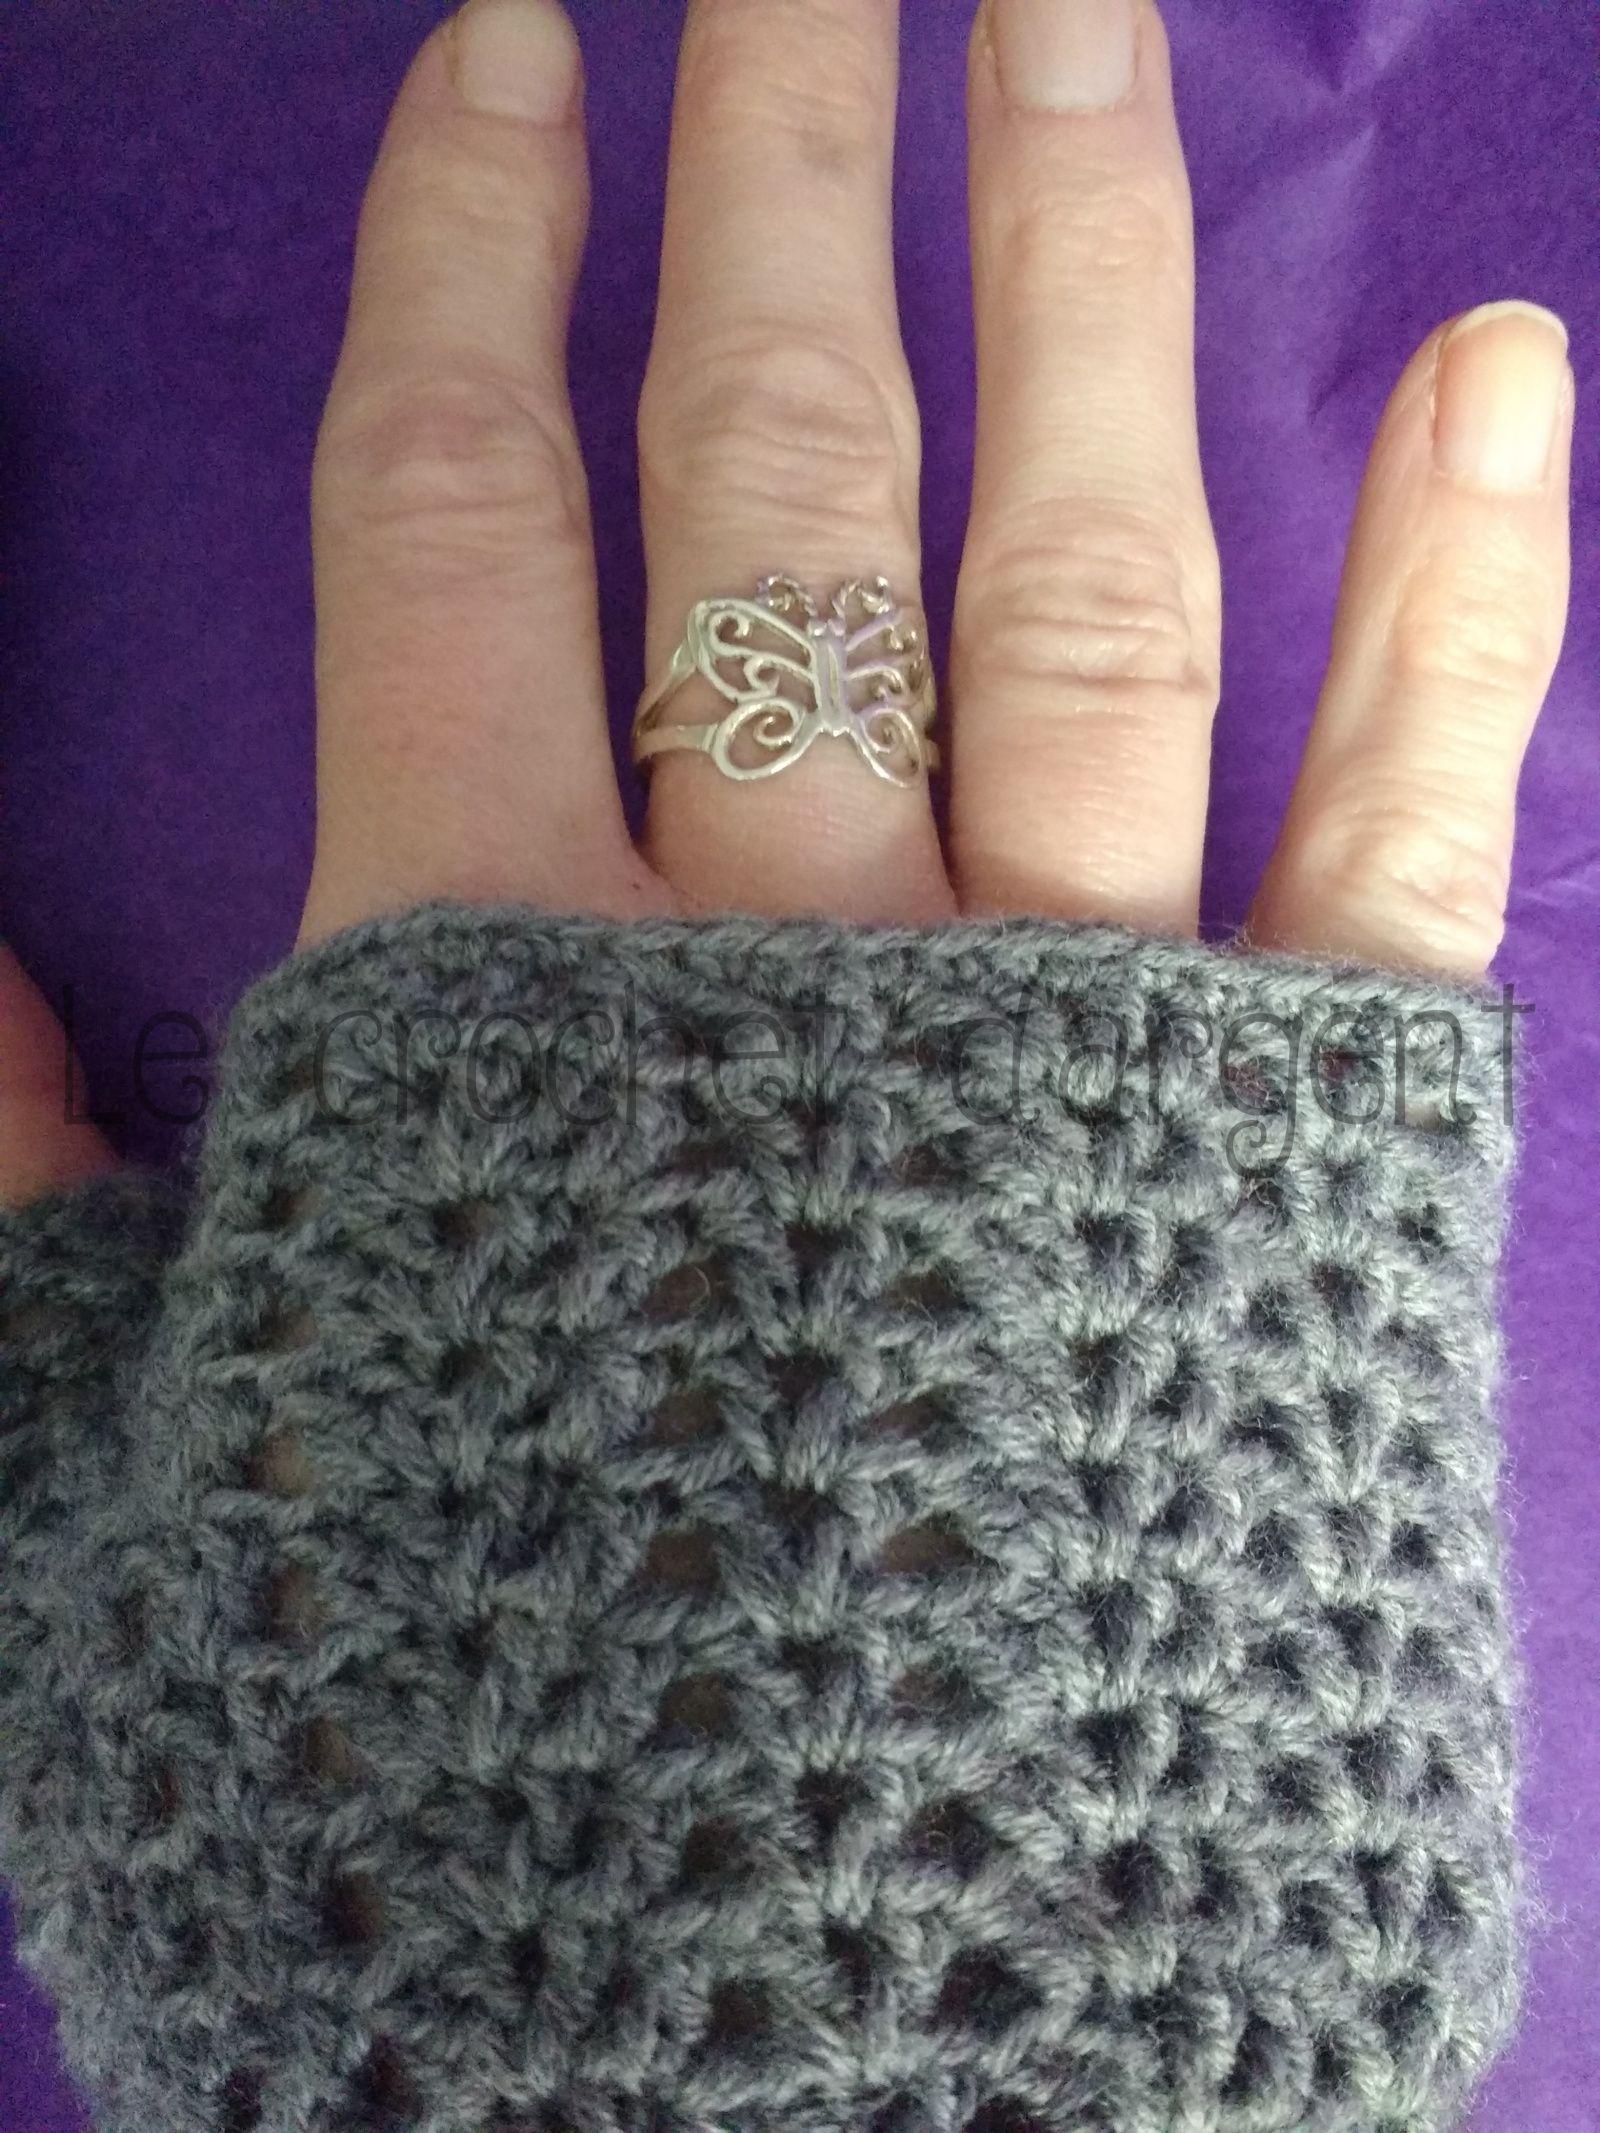 Mitaines dentelle au crochet | Mitaines en crochet, Dentelle au crochet et Tricot et crochet